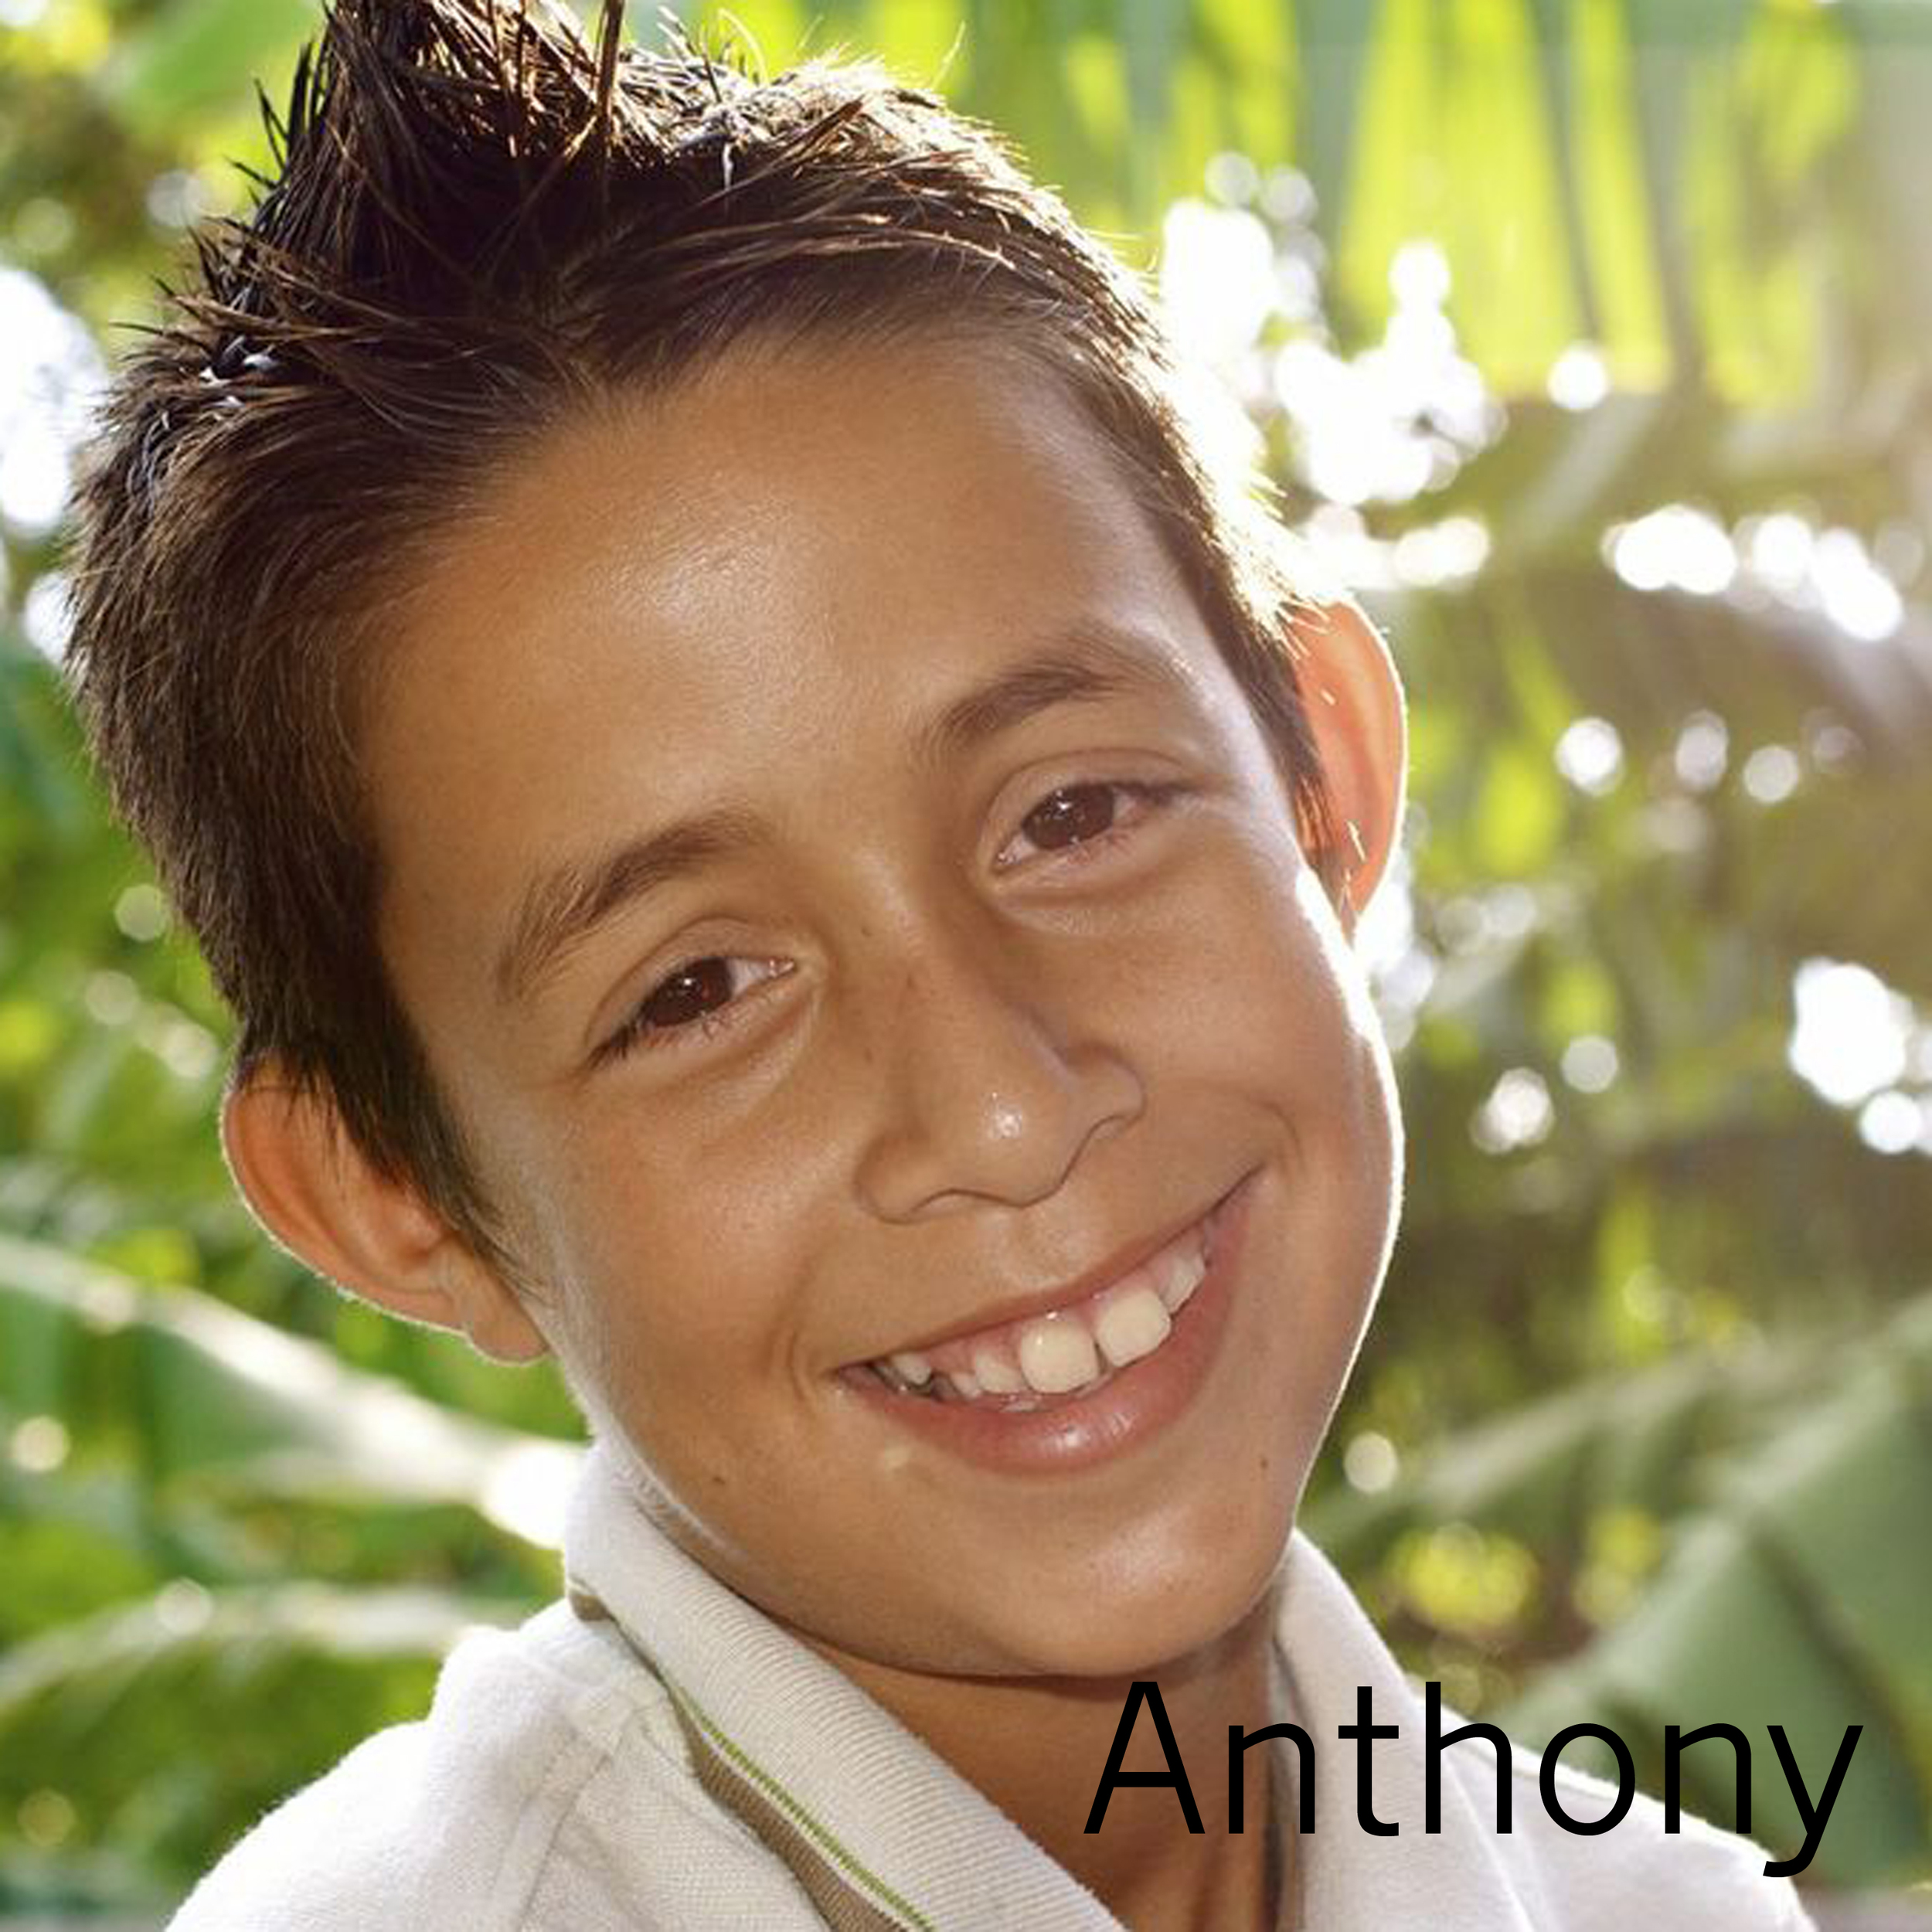 anthony003_Name.jpg